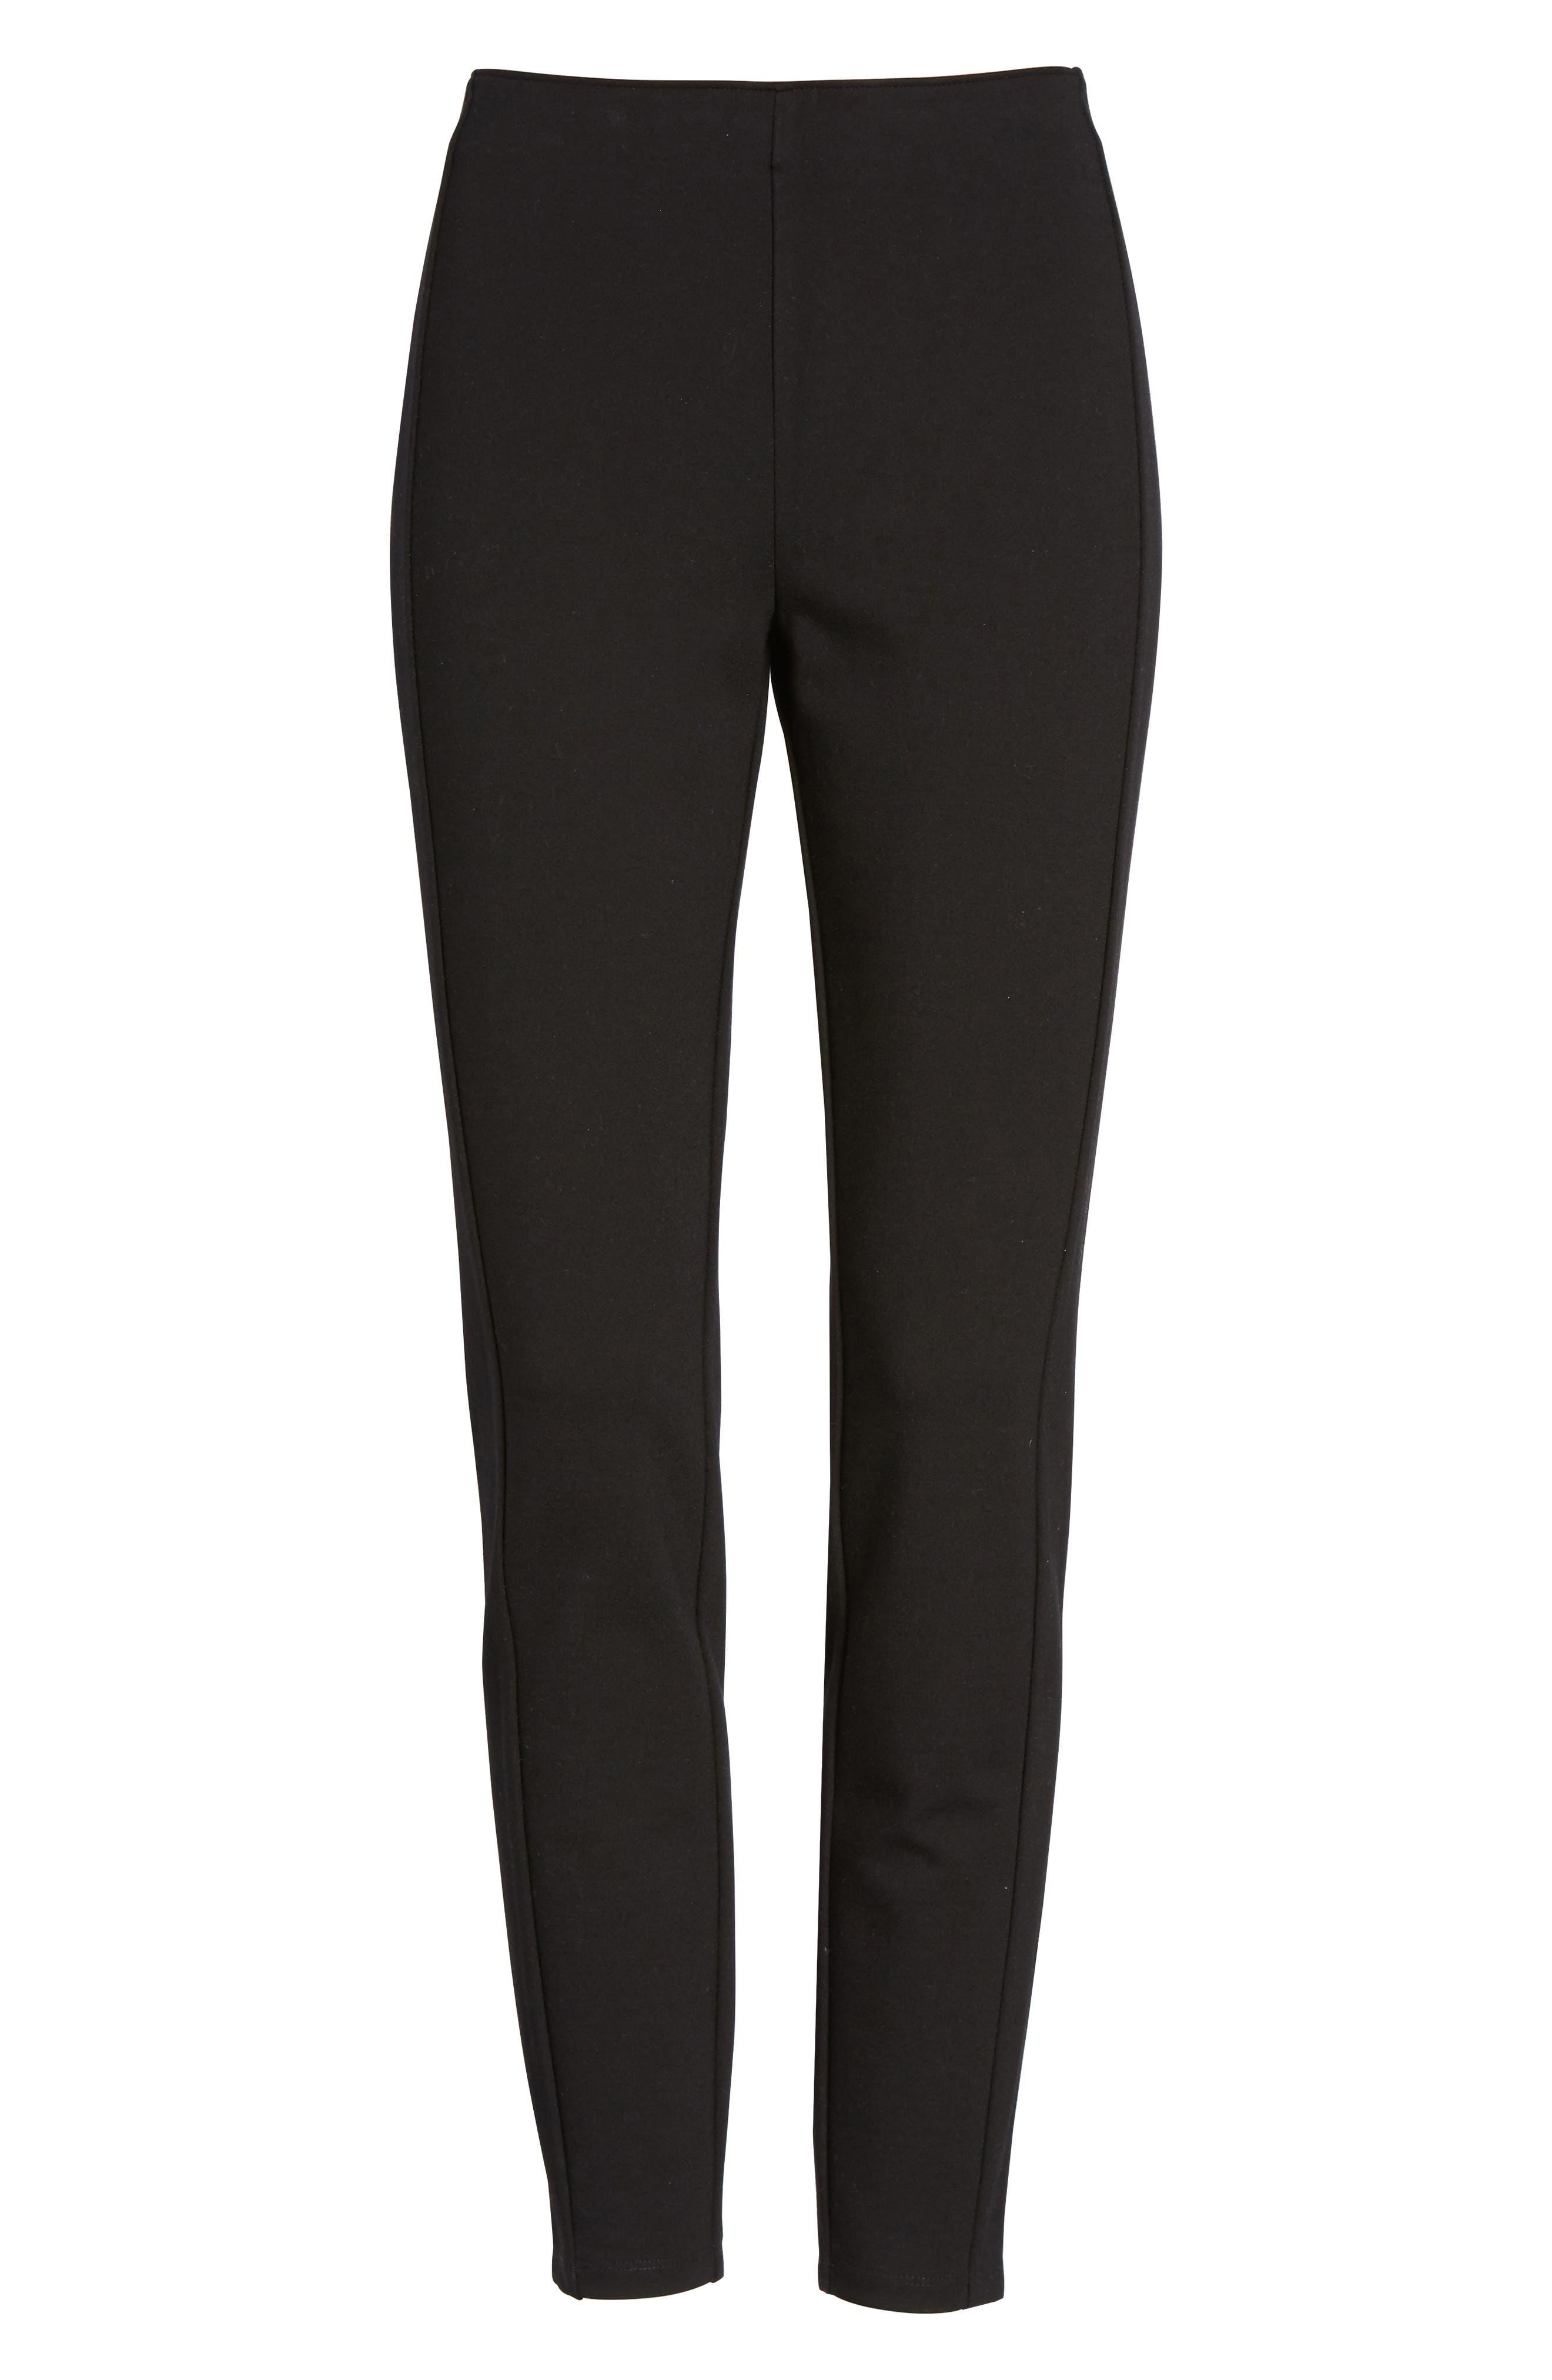 Skinny Ponte Knit Pants,                             Alternate thumbnail 6, color,                             001